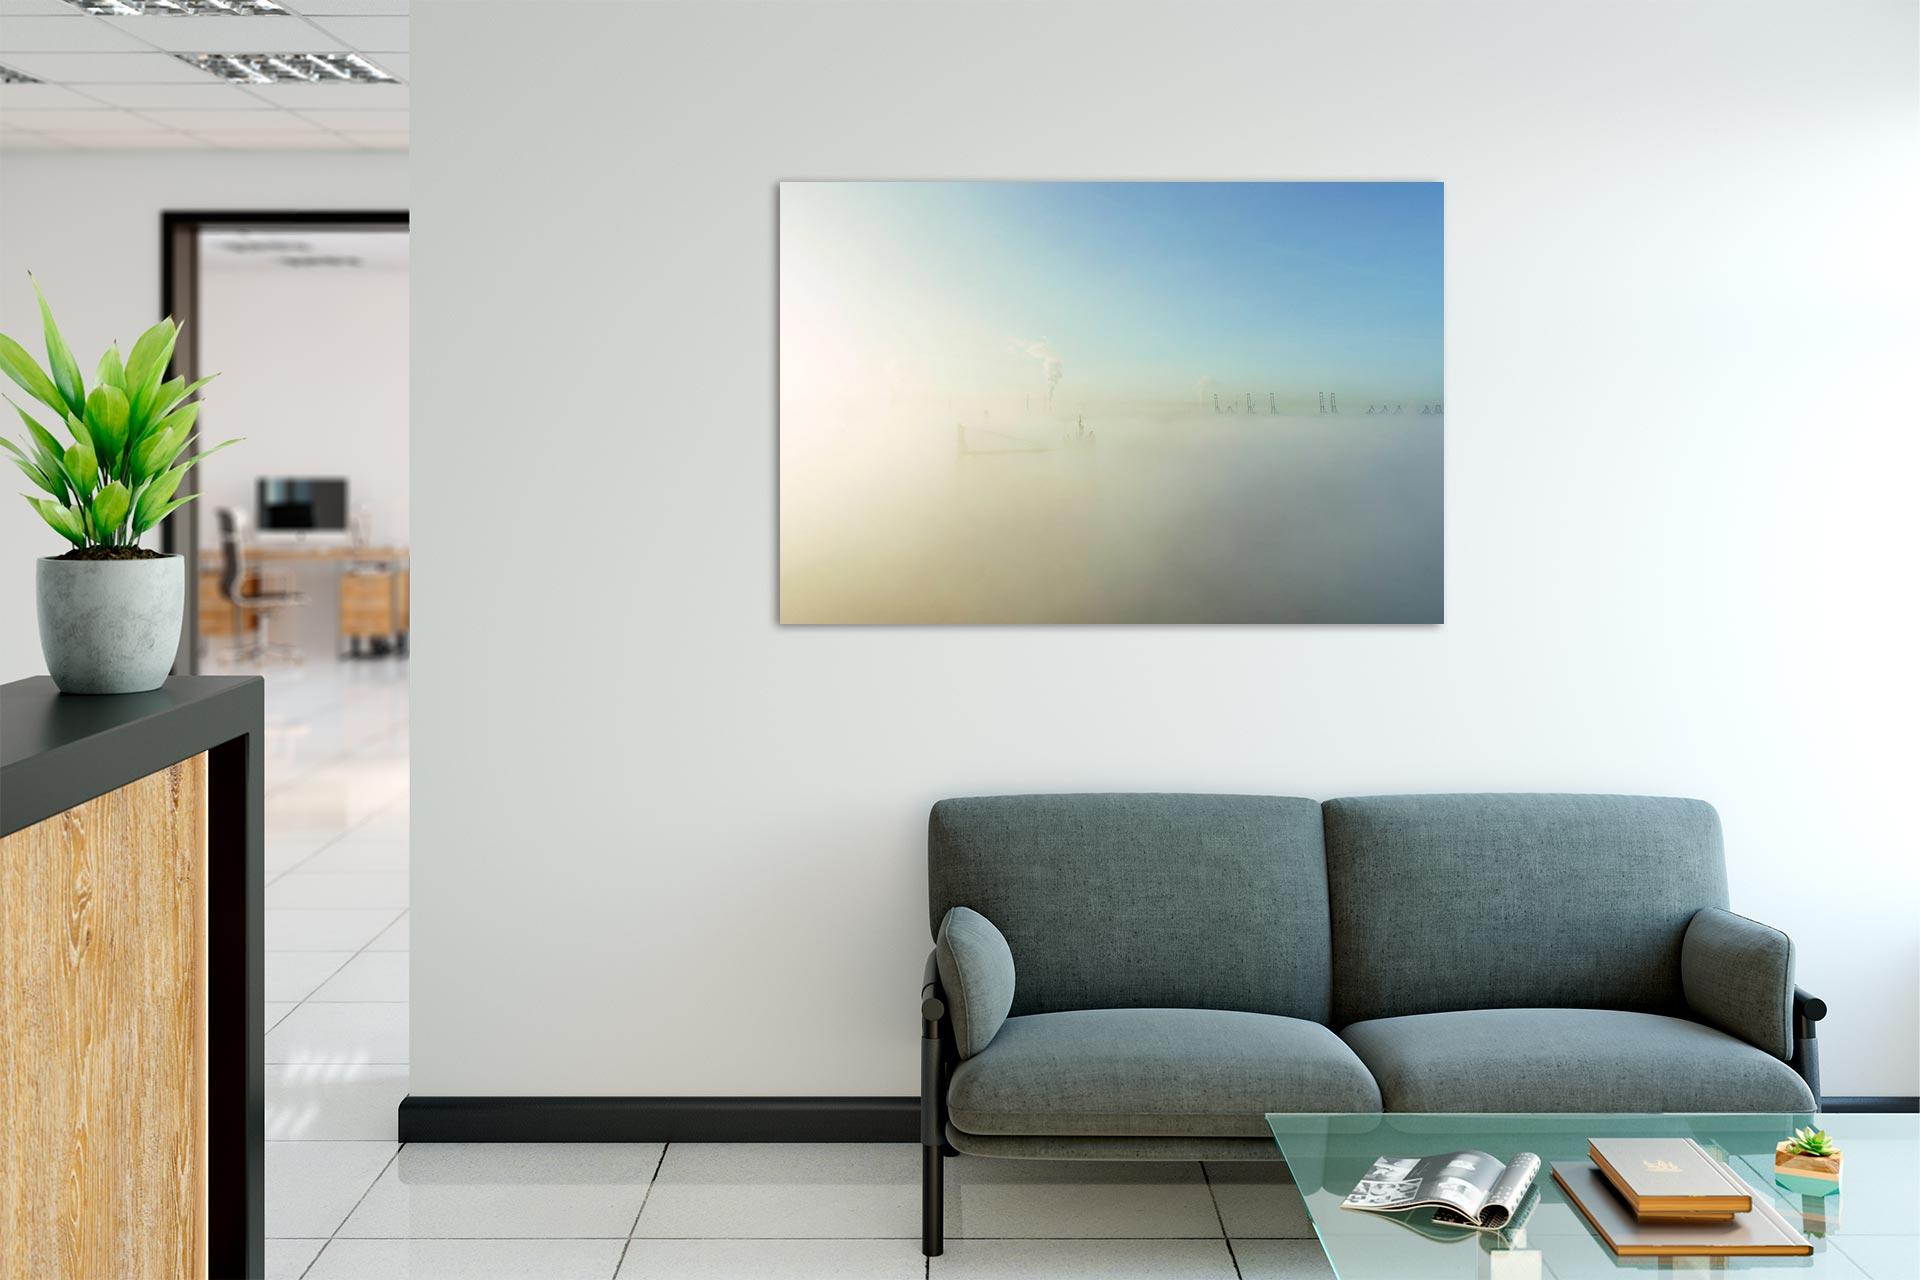 LCW260-nebelgiraffen-hamburg-wandbild-bild-auf-leinwand-acrylglas-aludibond-empfang